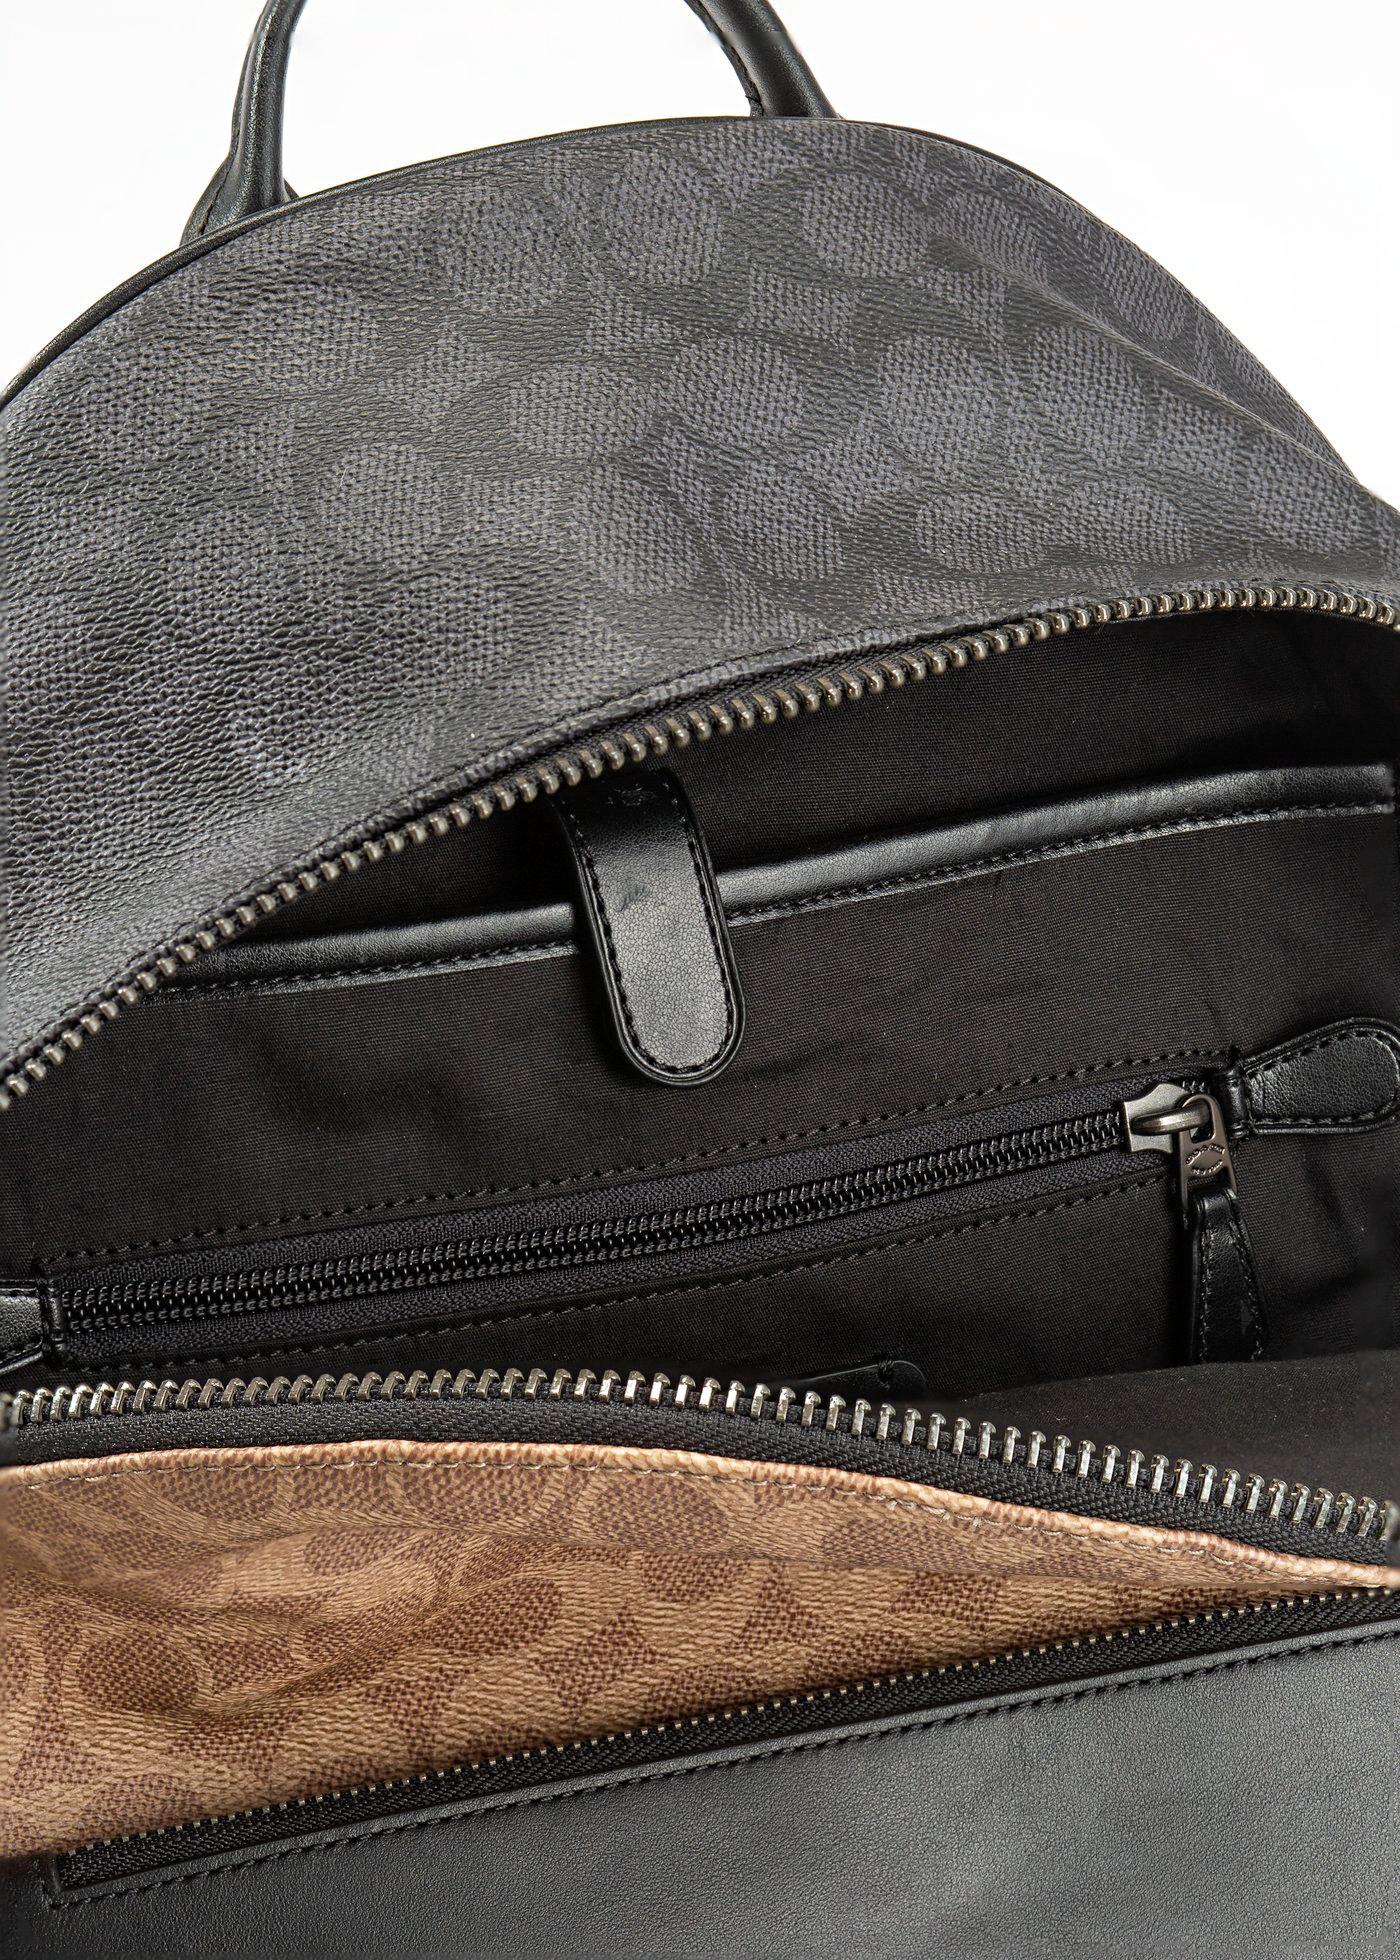 METRO Backpack image number 3